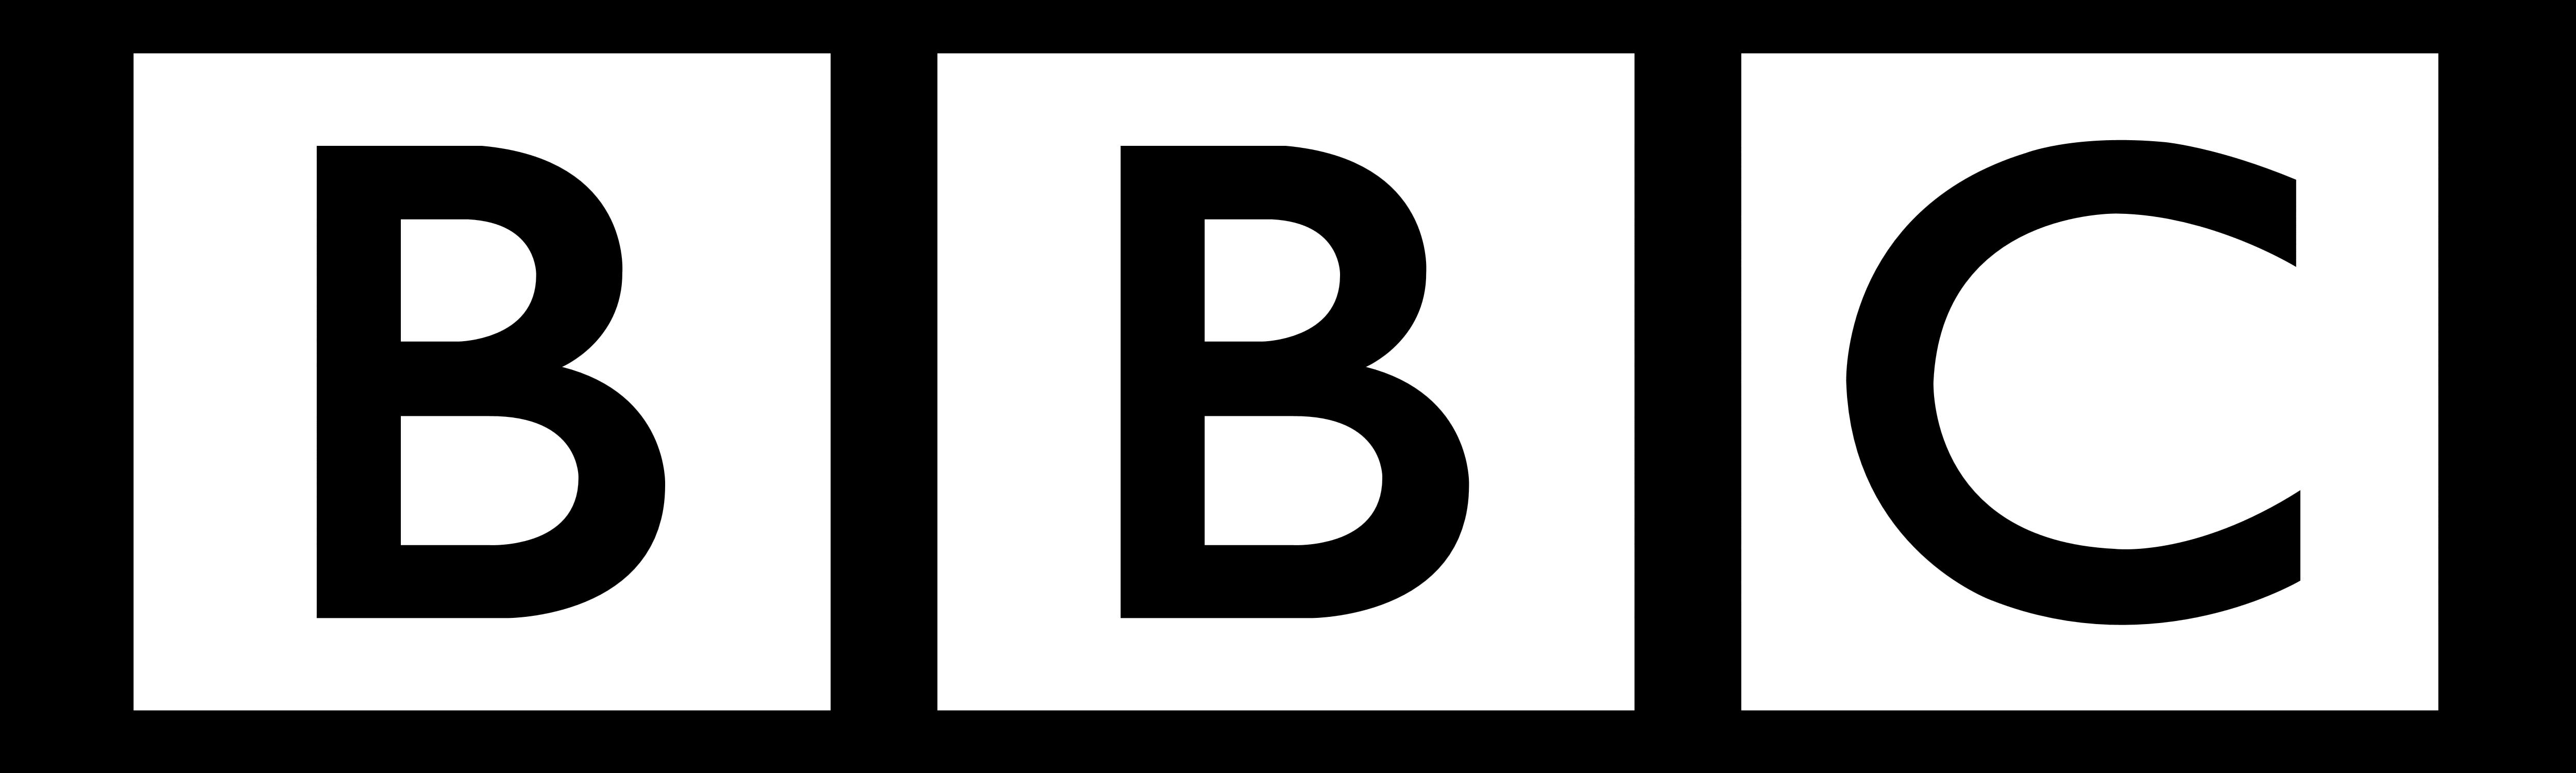 BBC_logo_black_background